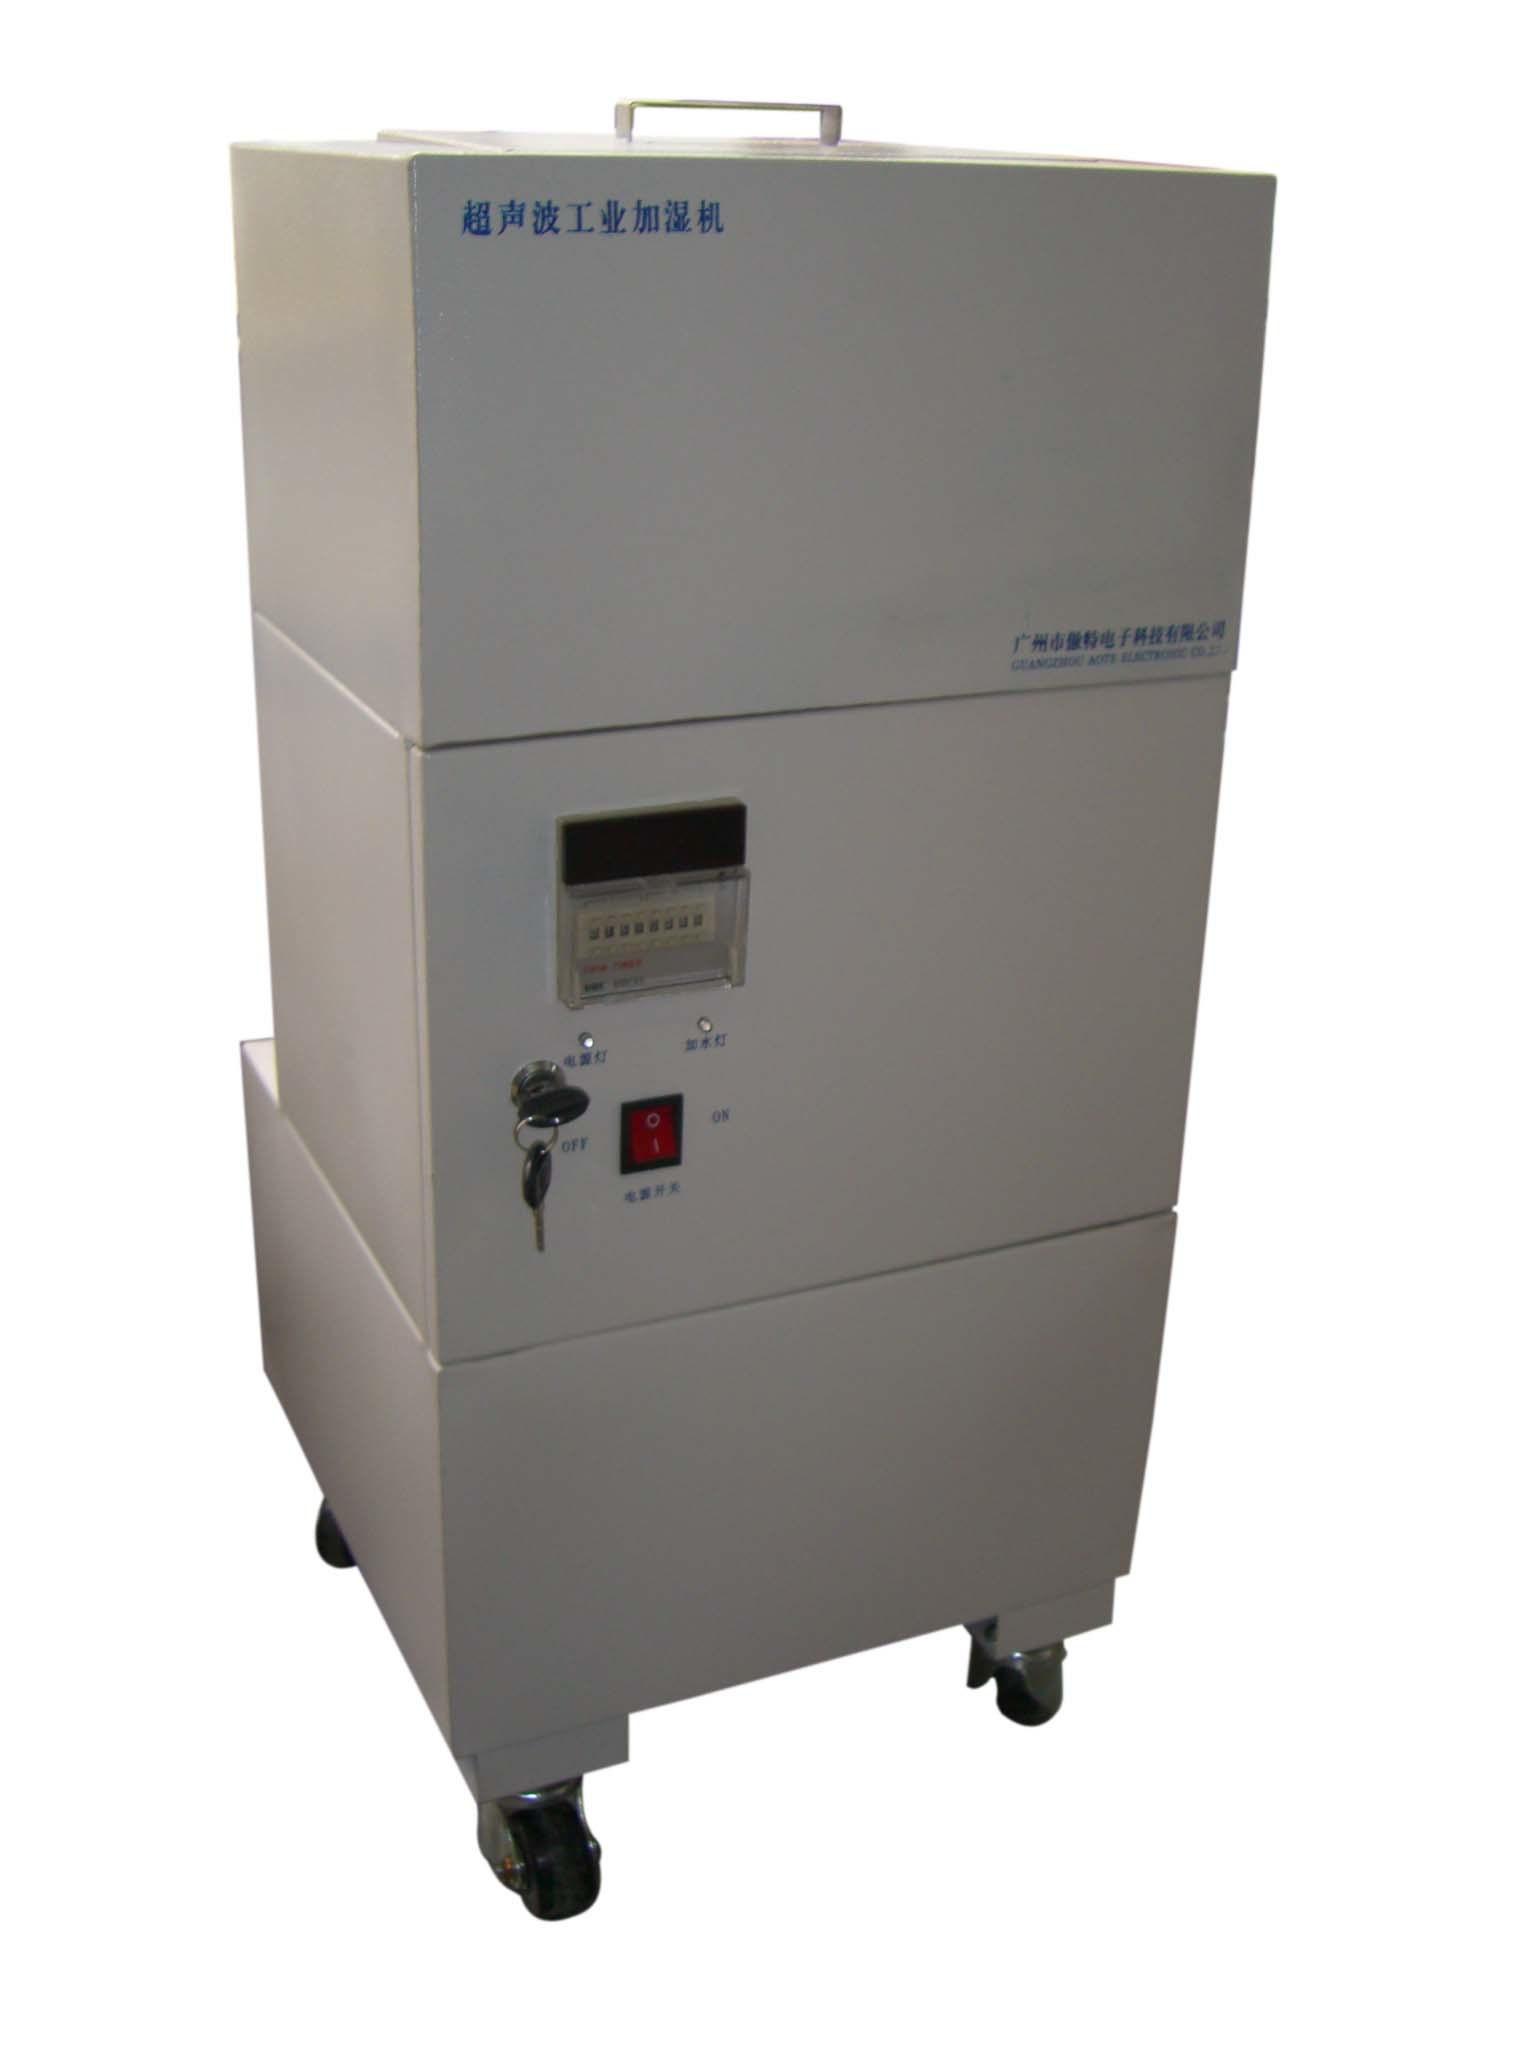 Humidifier (AOTE 06G) China Humidifier Industrial Humidifier #888844